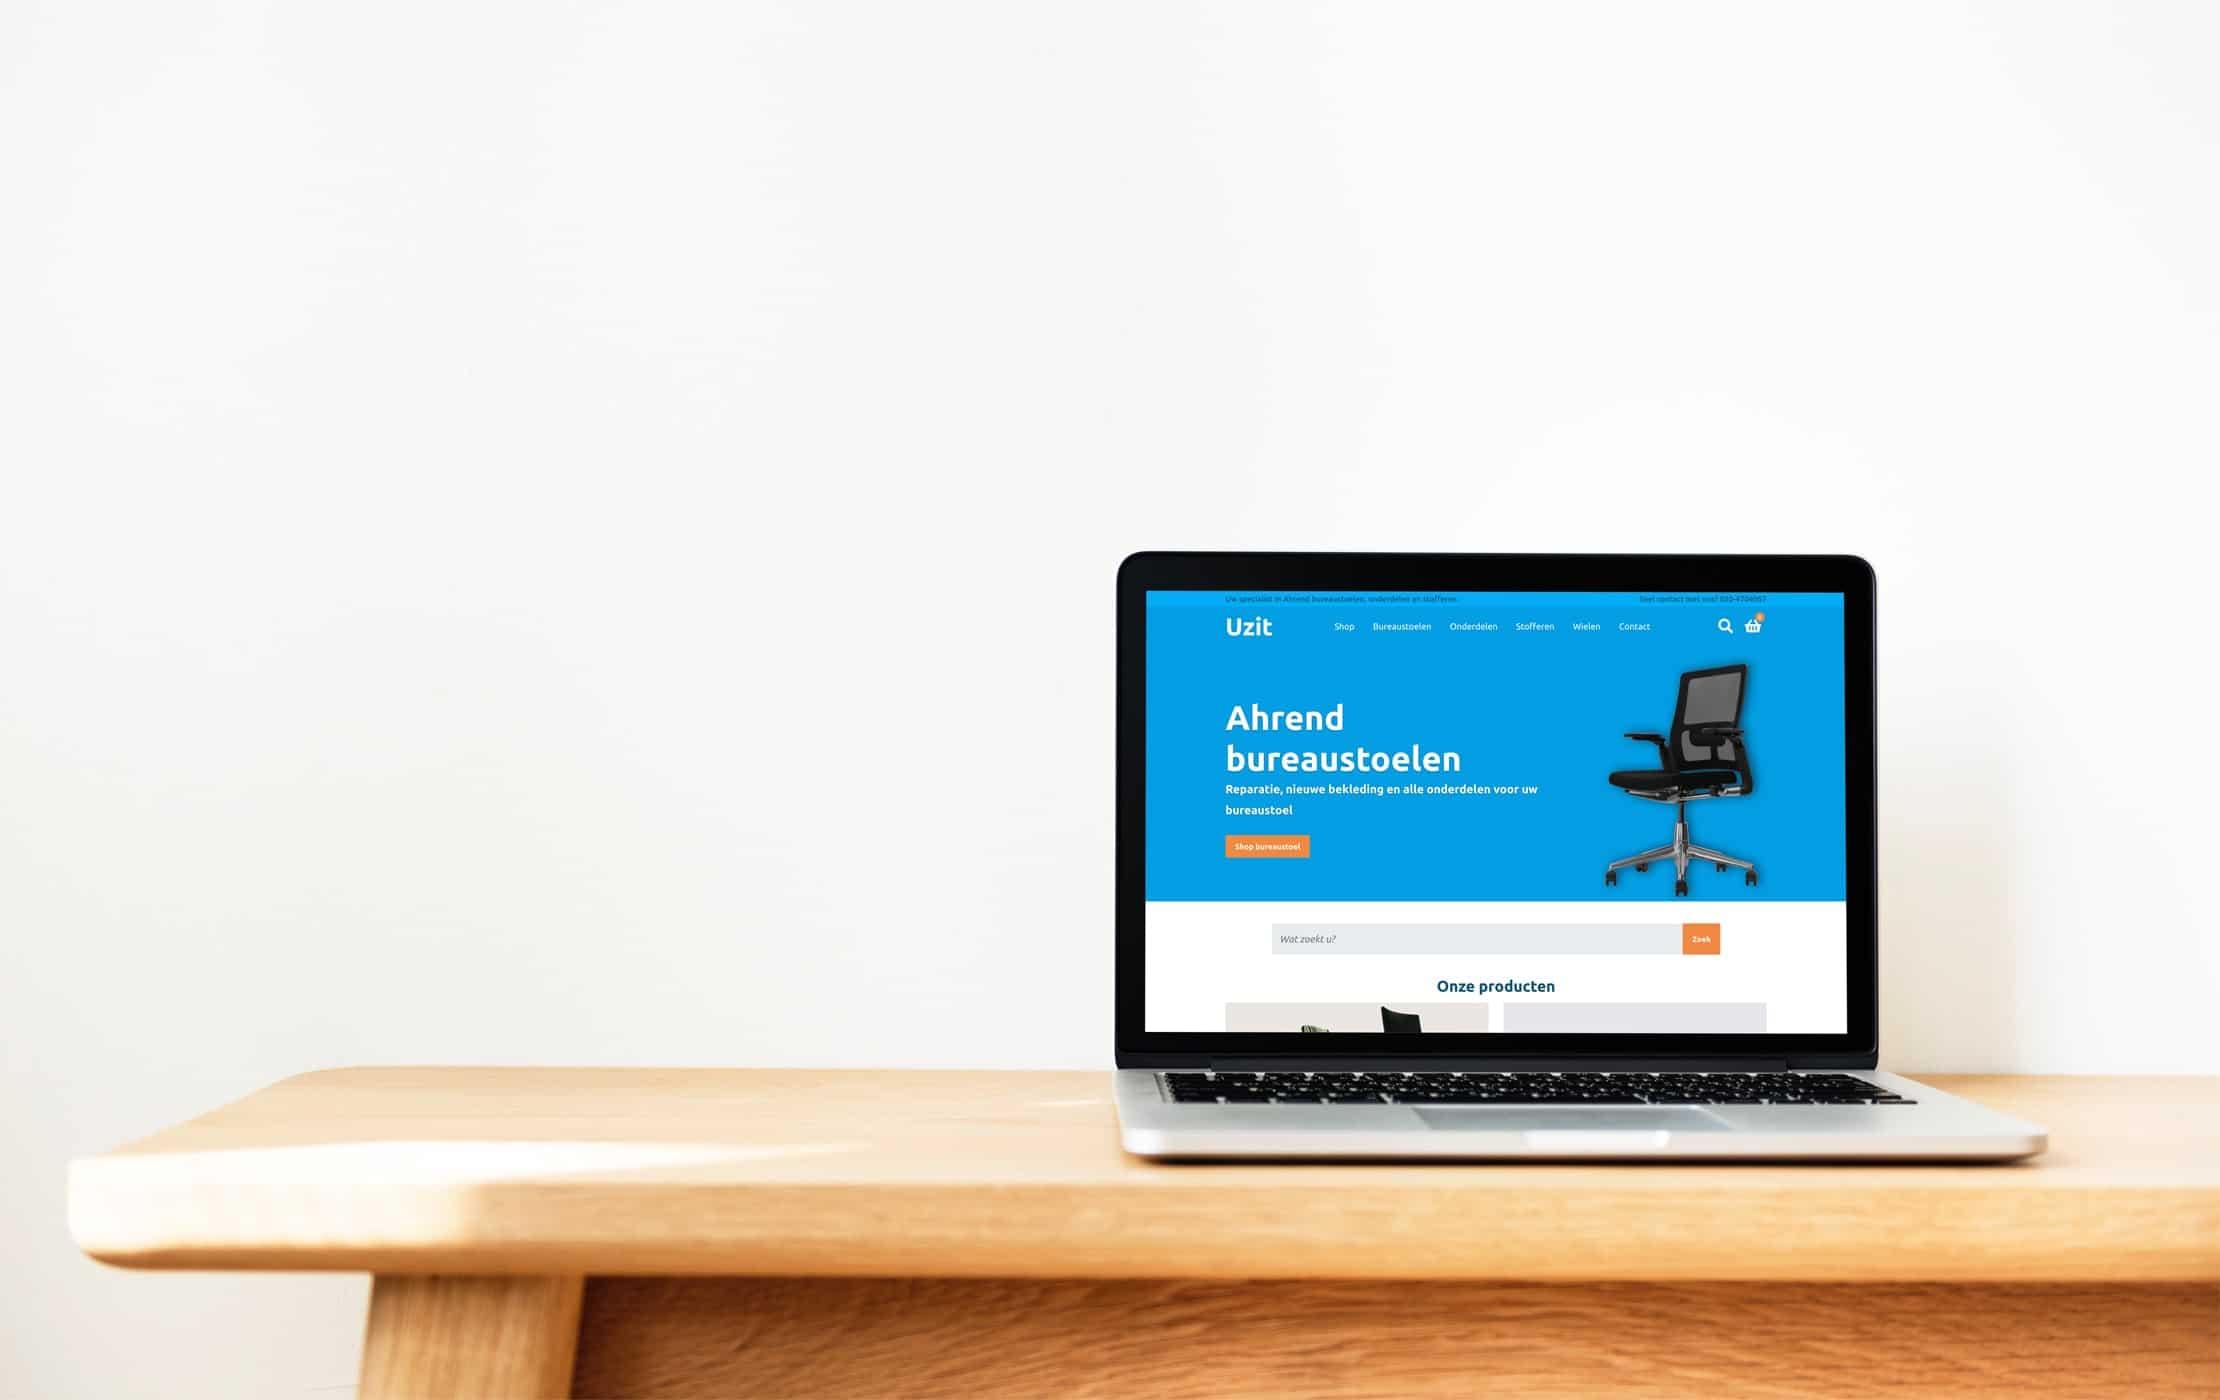 wordpress_website_uzit_dreamlab_portfolio